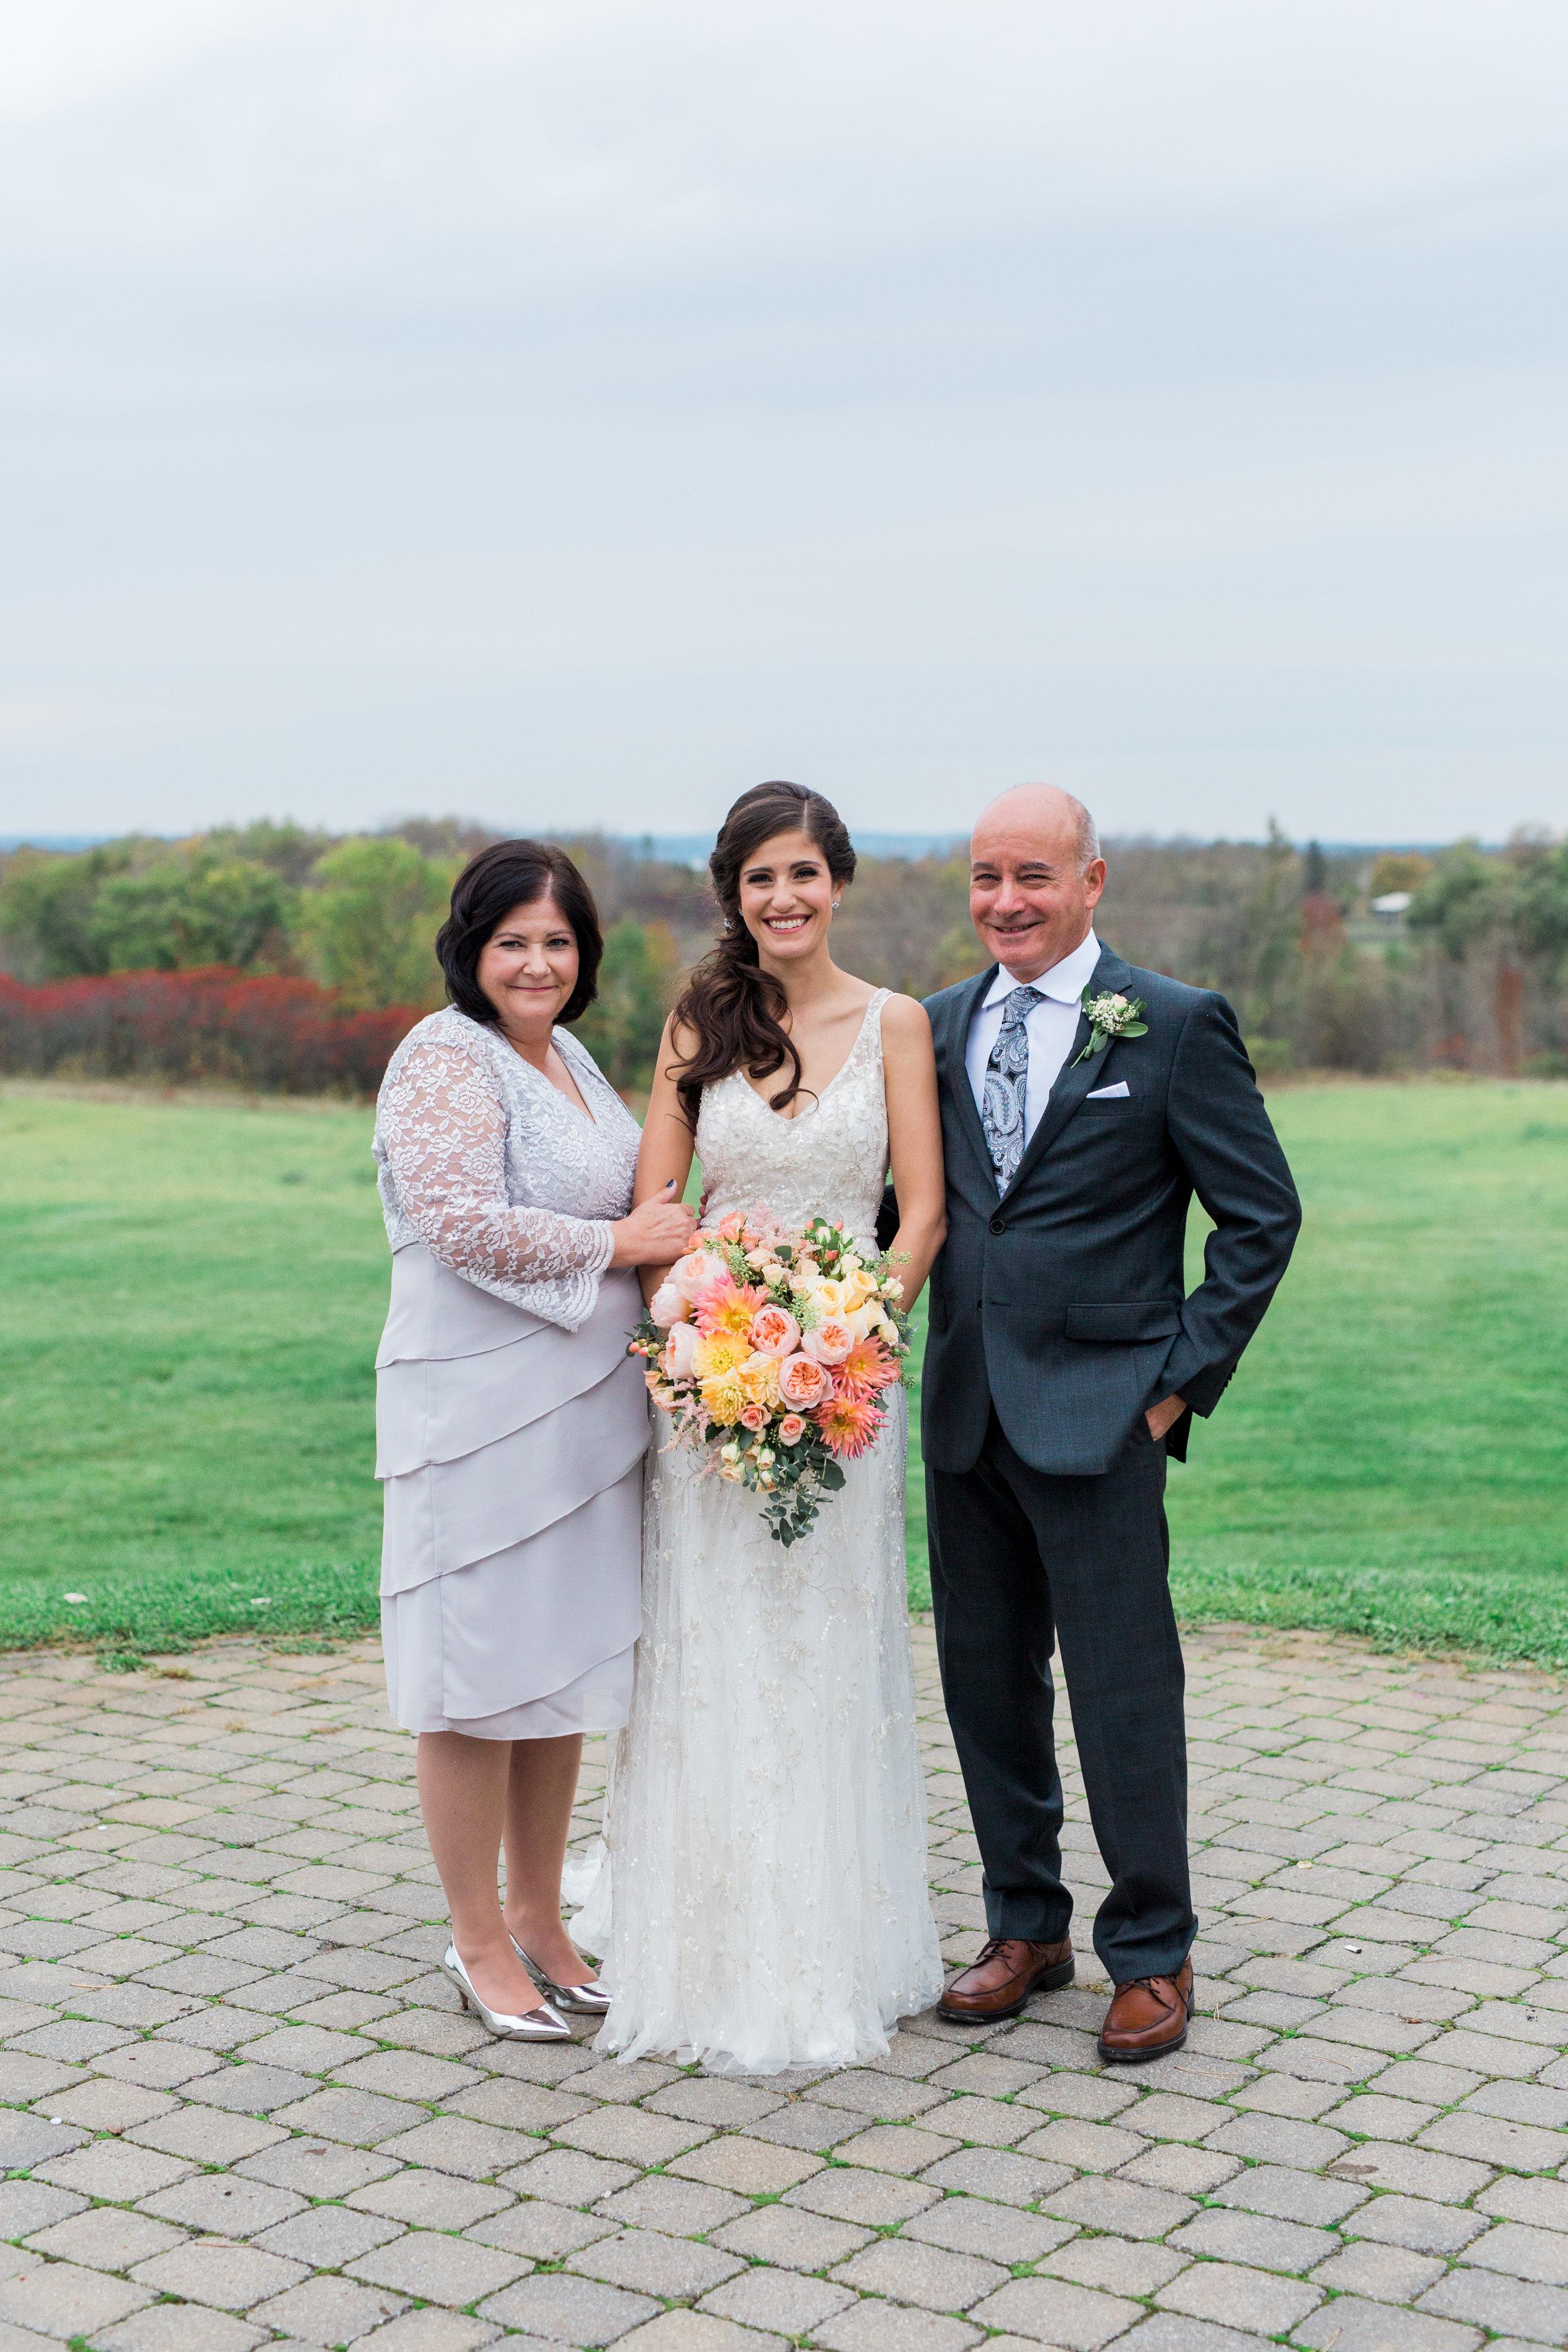 Amir-Golbazi-Danielle-Giroux-Photography_Toronto-Wedding_Cedarwood_Rachel-Paul_353.jpg